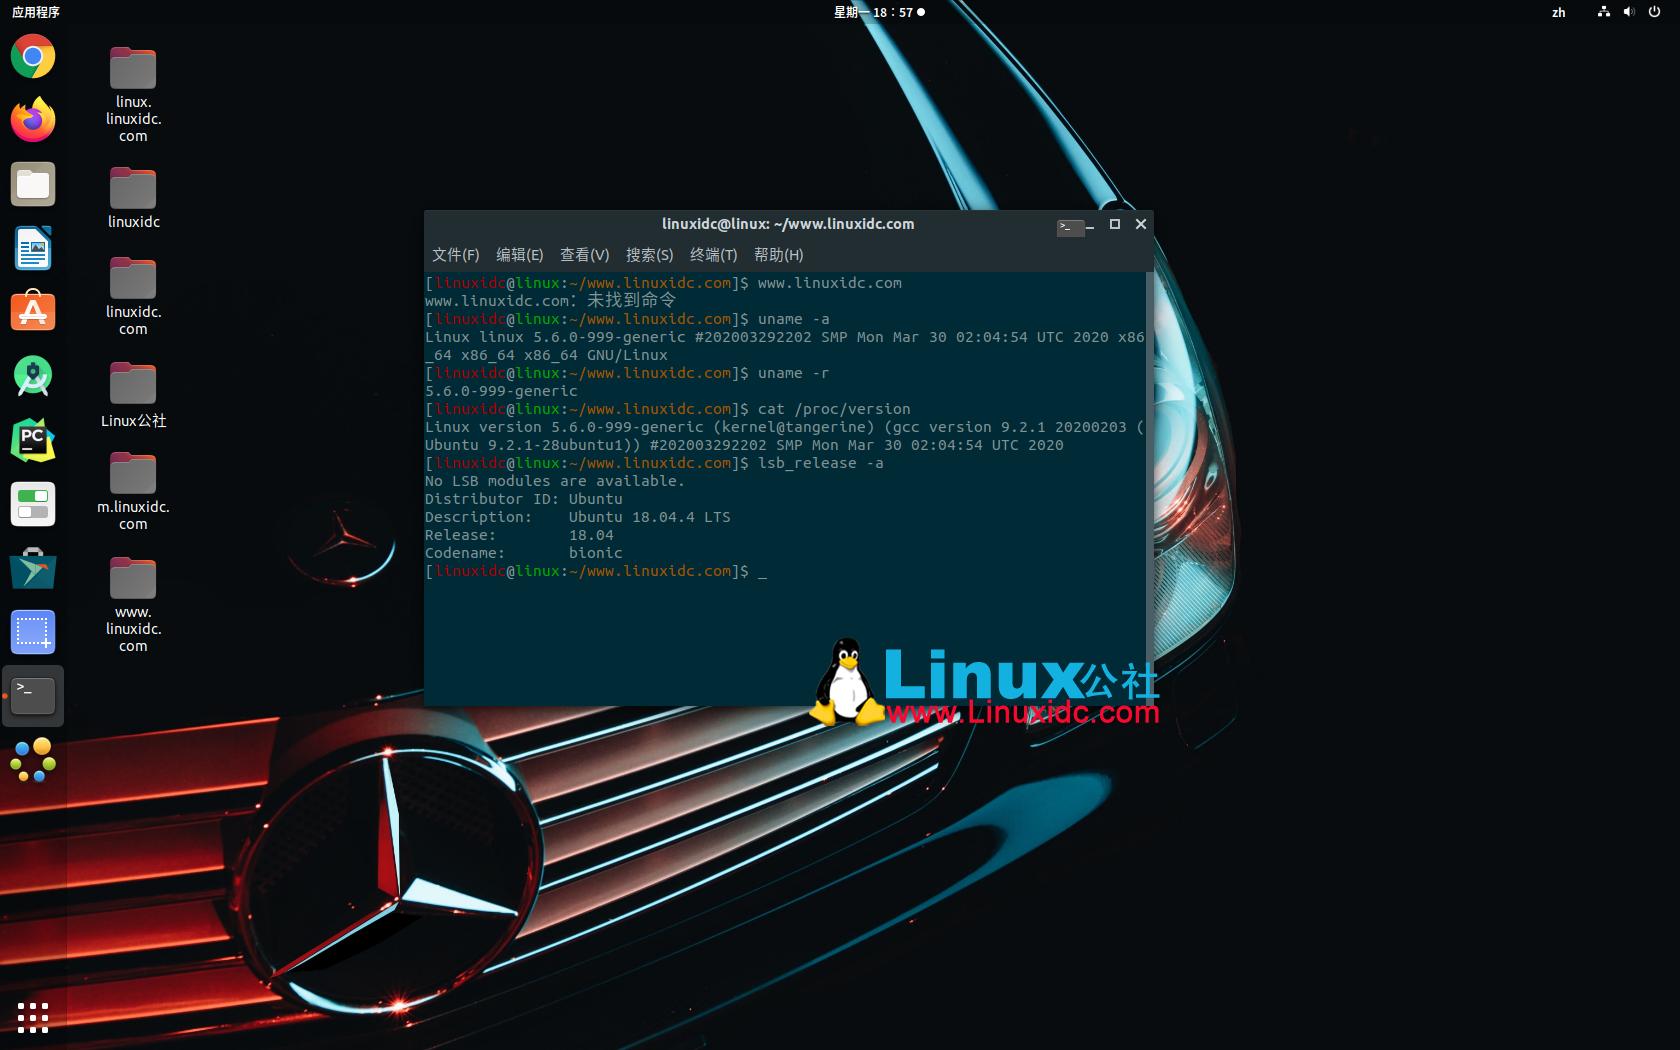 如何在Ubuntu 20.04/18.04中安装Linux kernel 5.6